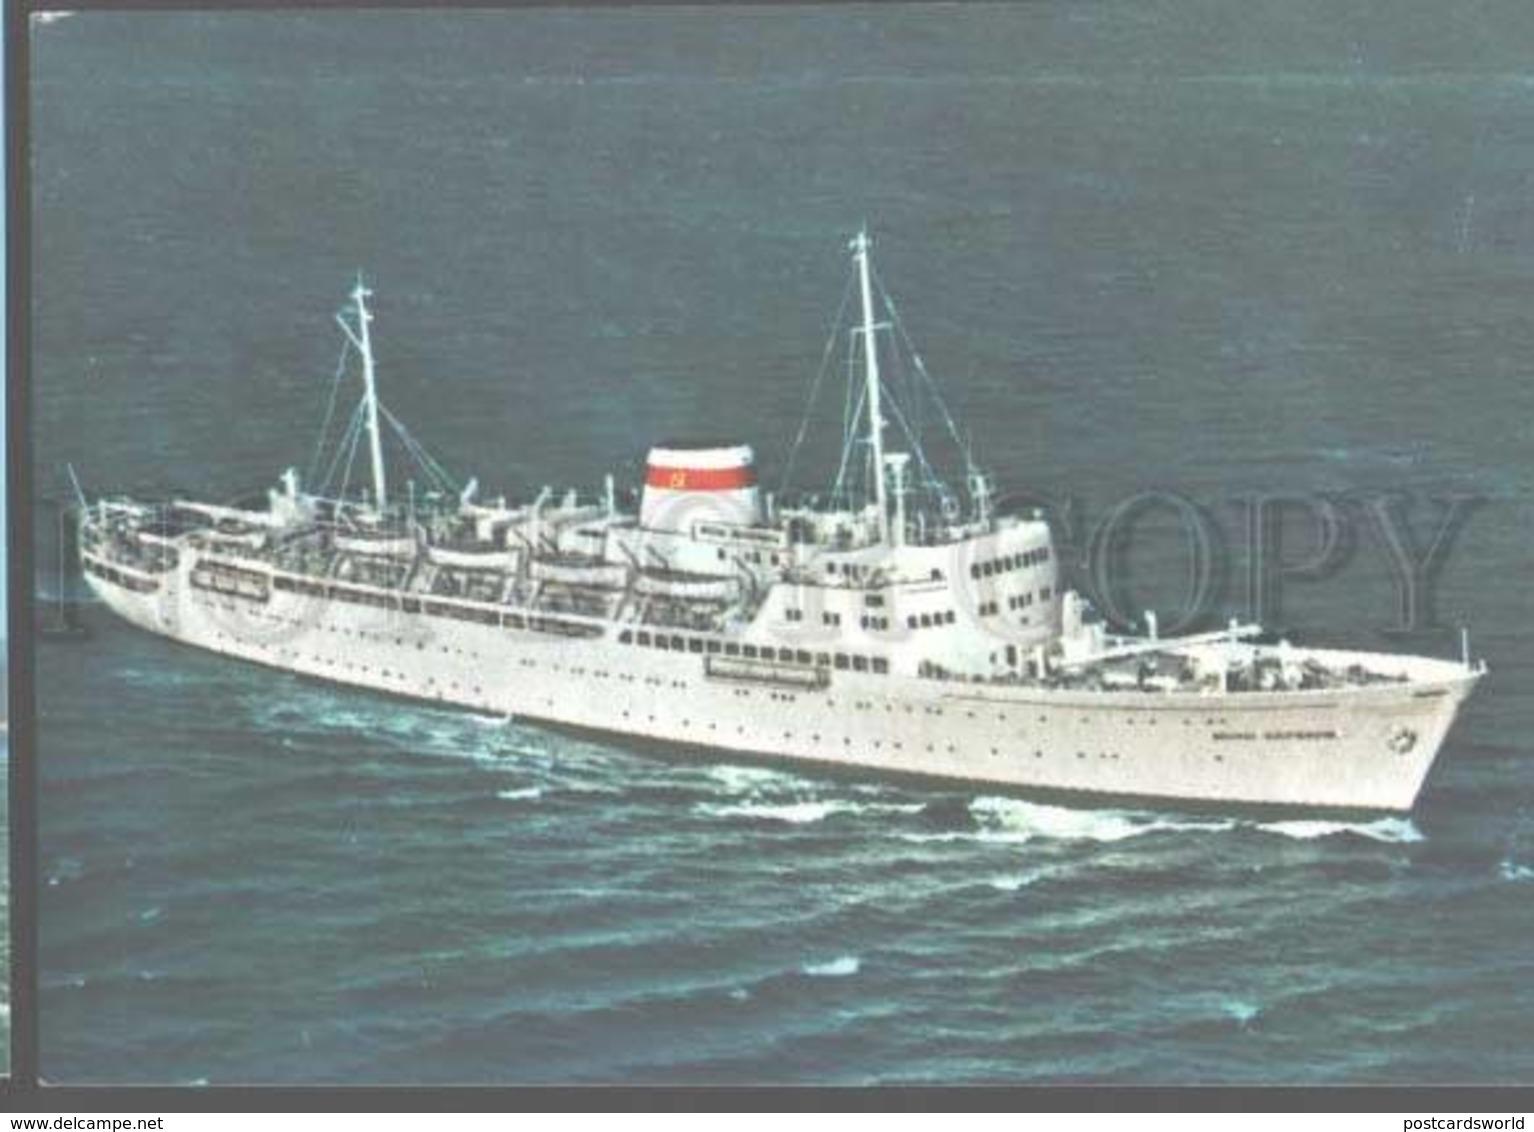 105394 USSR RUSSIA Motorship MIKHAIL KALININ Steam-ship Old PC - Ships